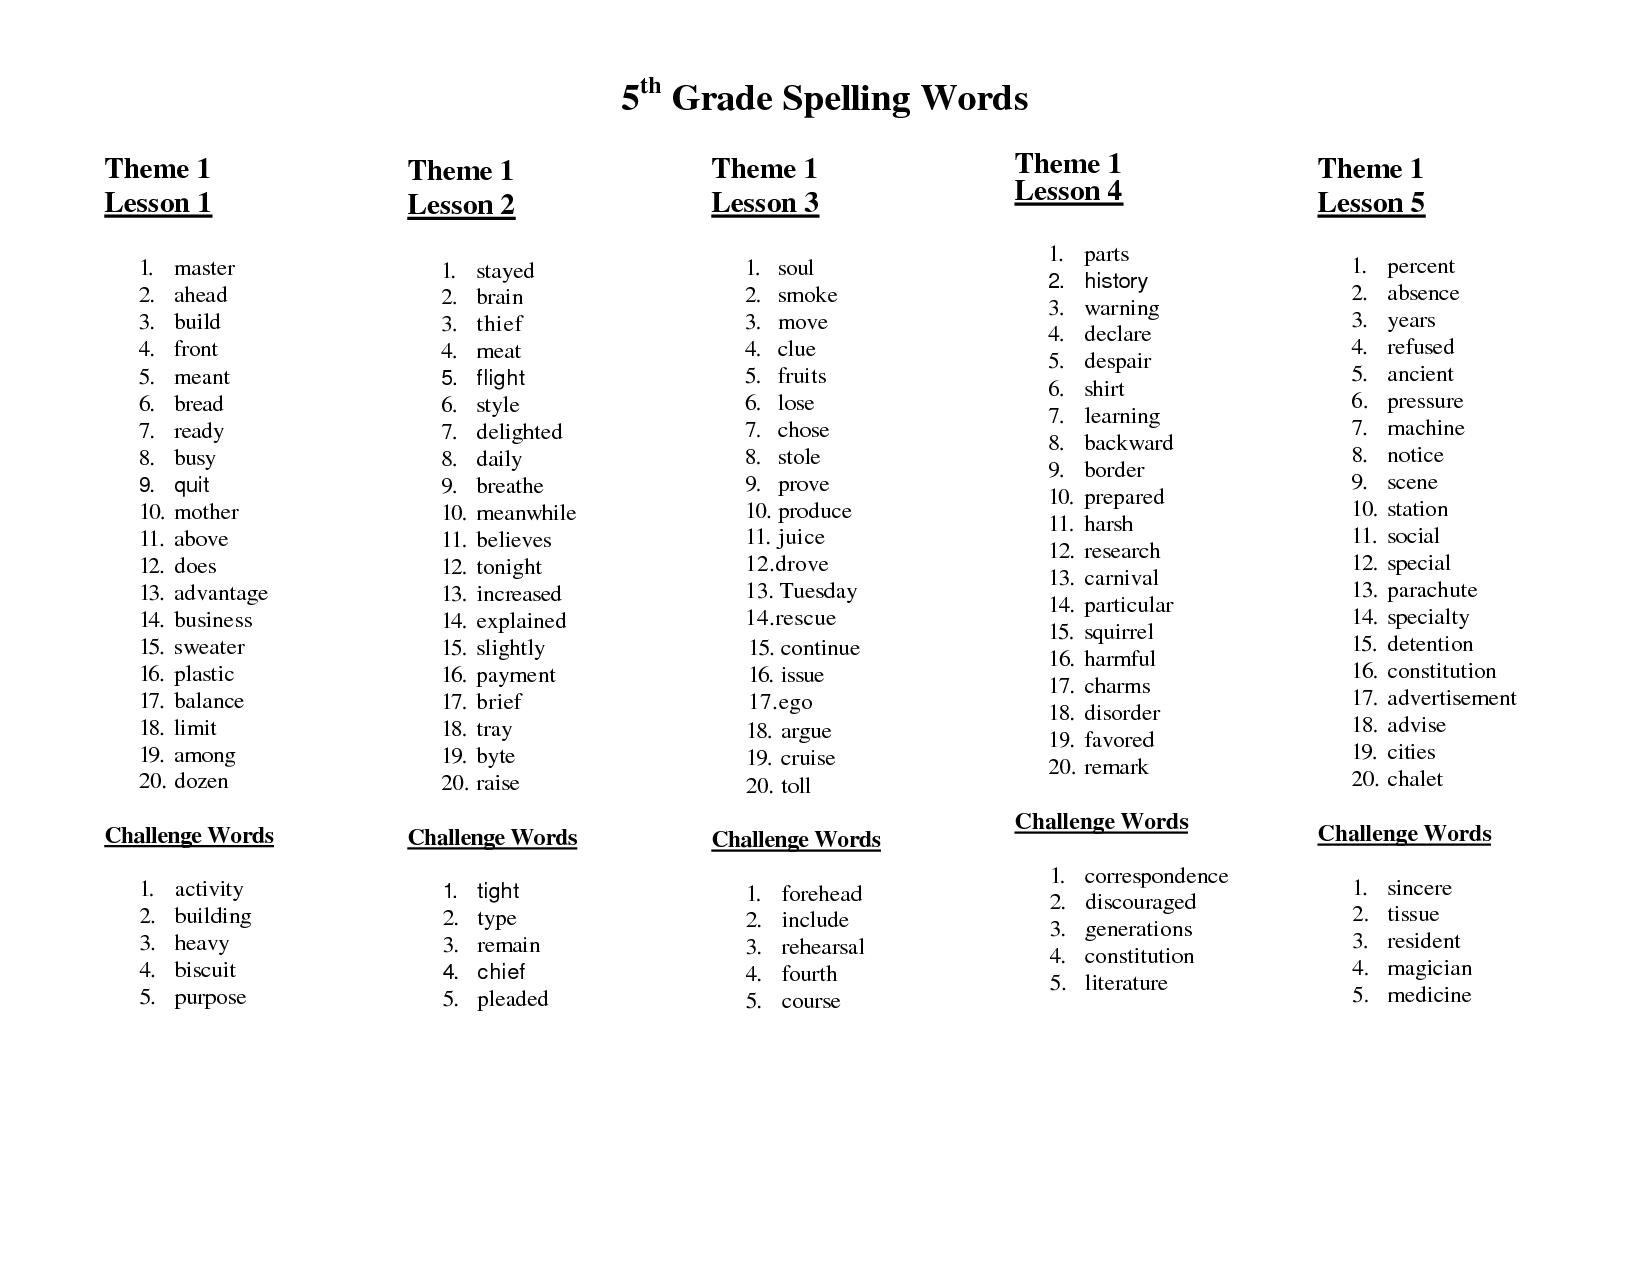 7th Grade Spelling Worksheets Printable - Resume Examples